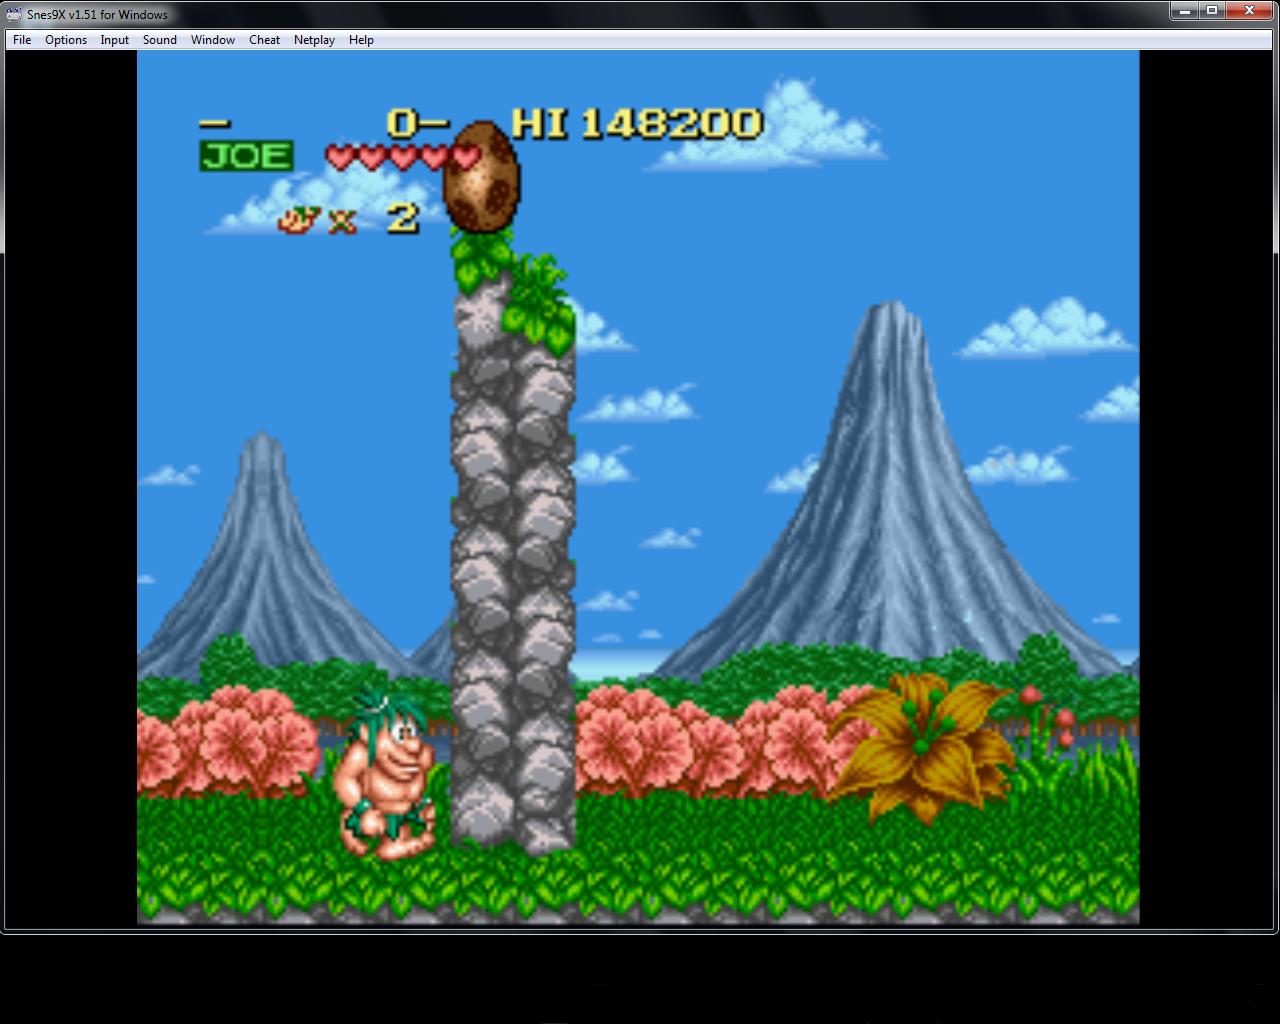 bubufubu: Joe & Mac [Normal] (SNES/Super Famicom Emulated) 148,200 points on 2015-04-17 15:37:52